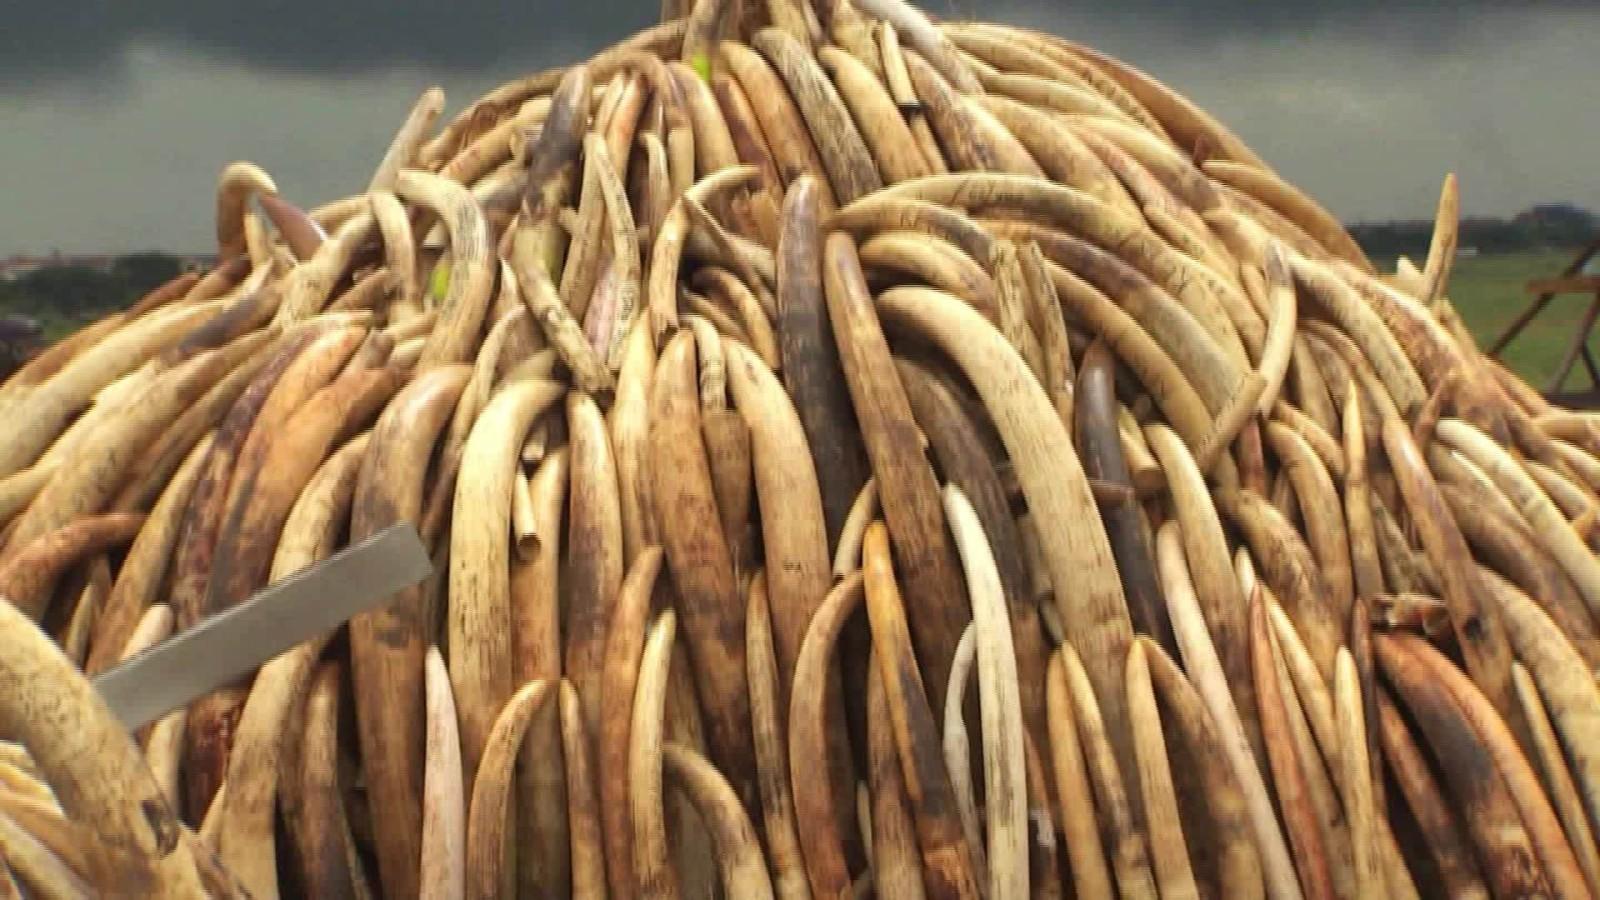 New British law bans ivory sales